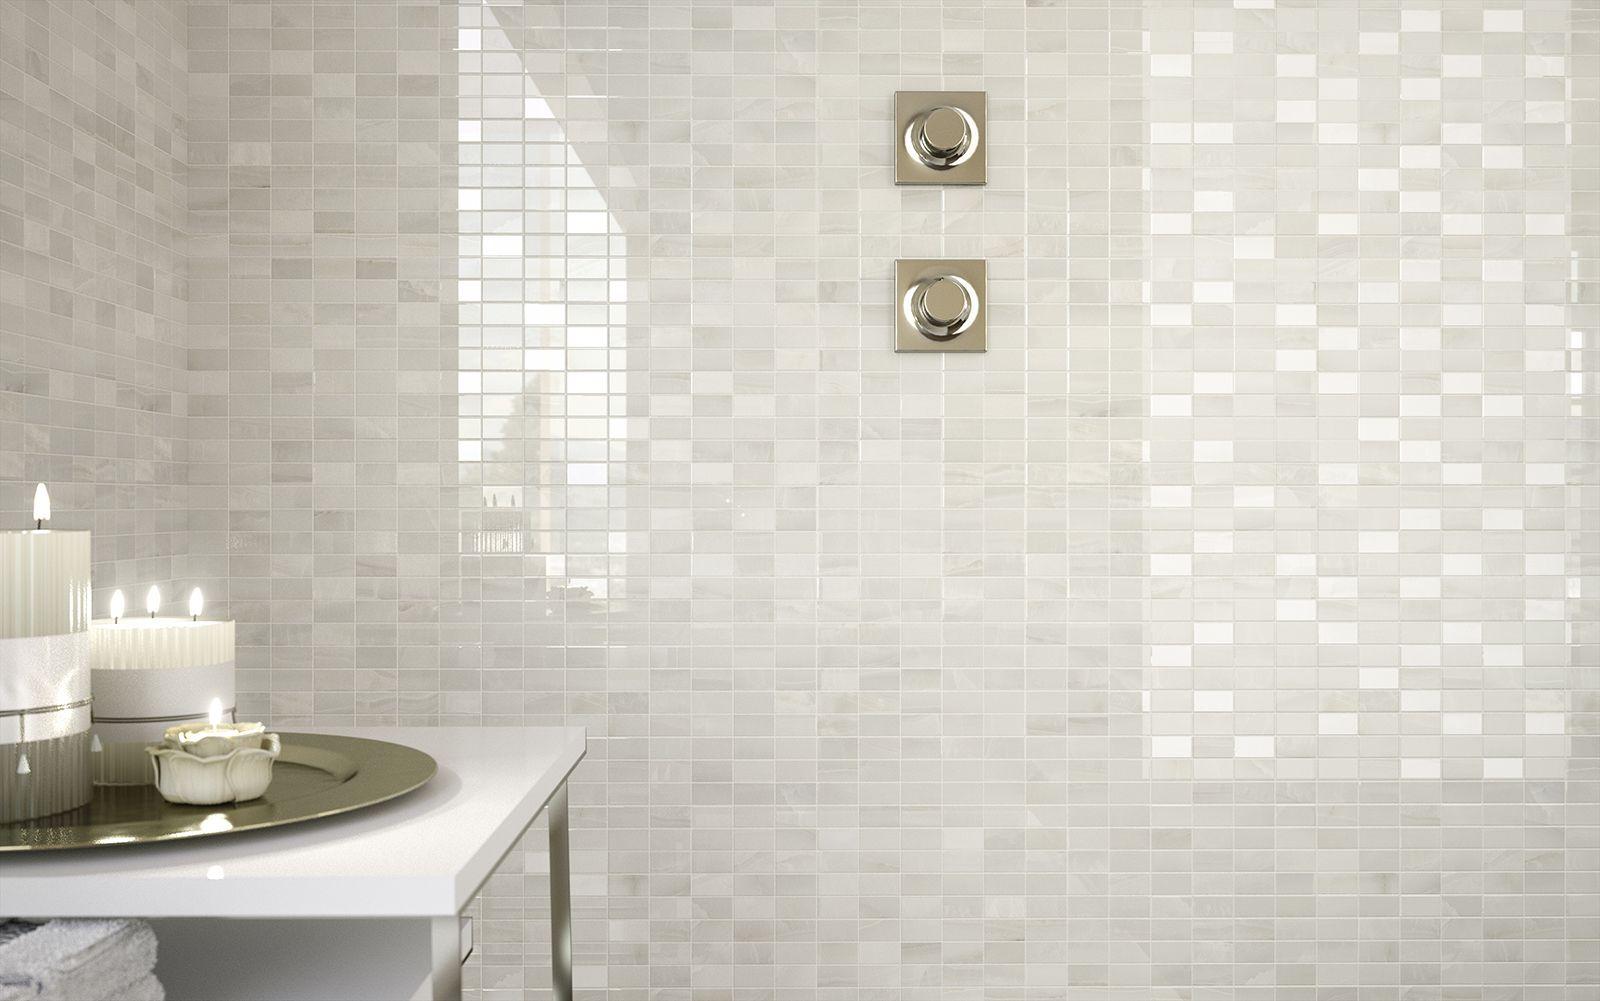 Onix - Gres imitación mármol para baño | Marazzi | Tiles | Pinterest ...